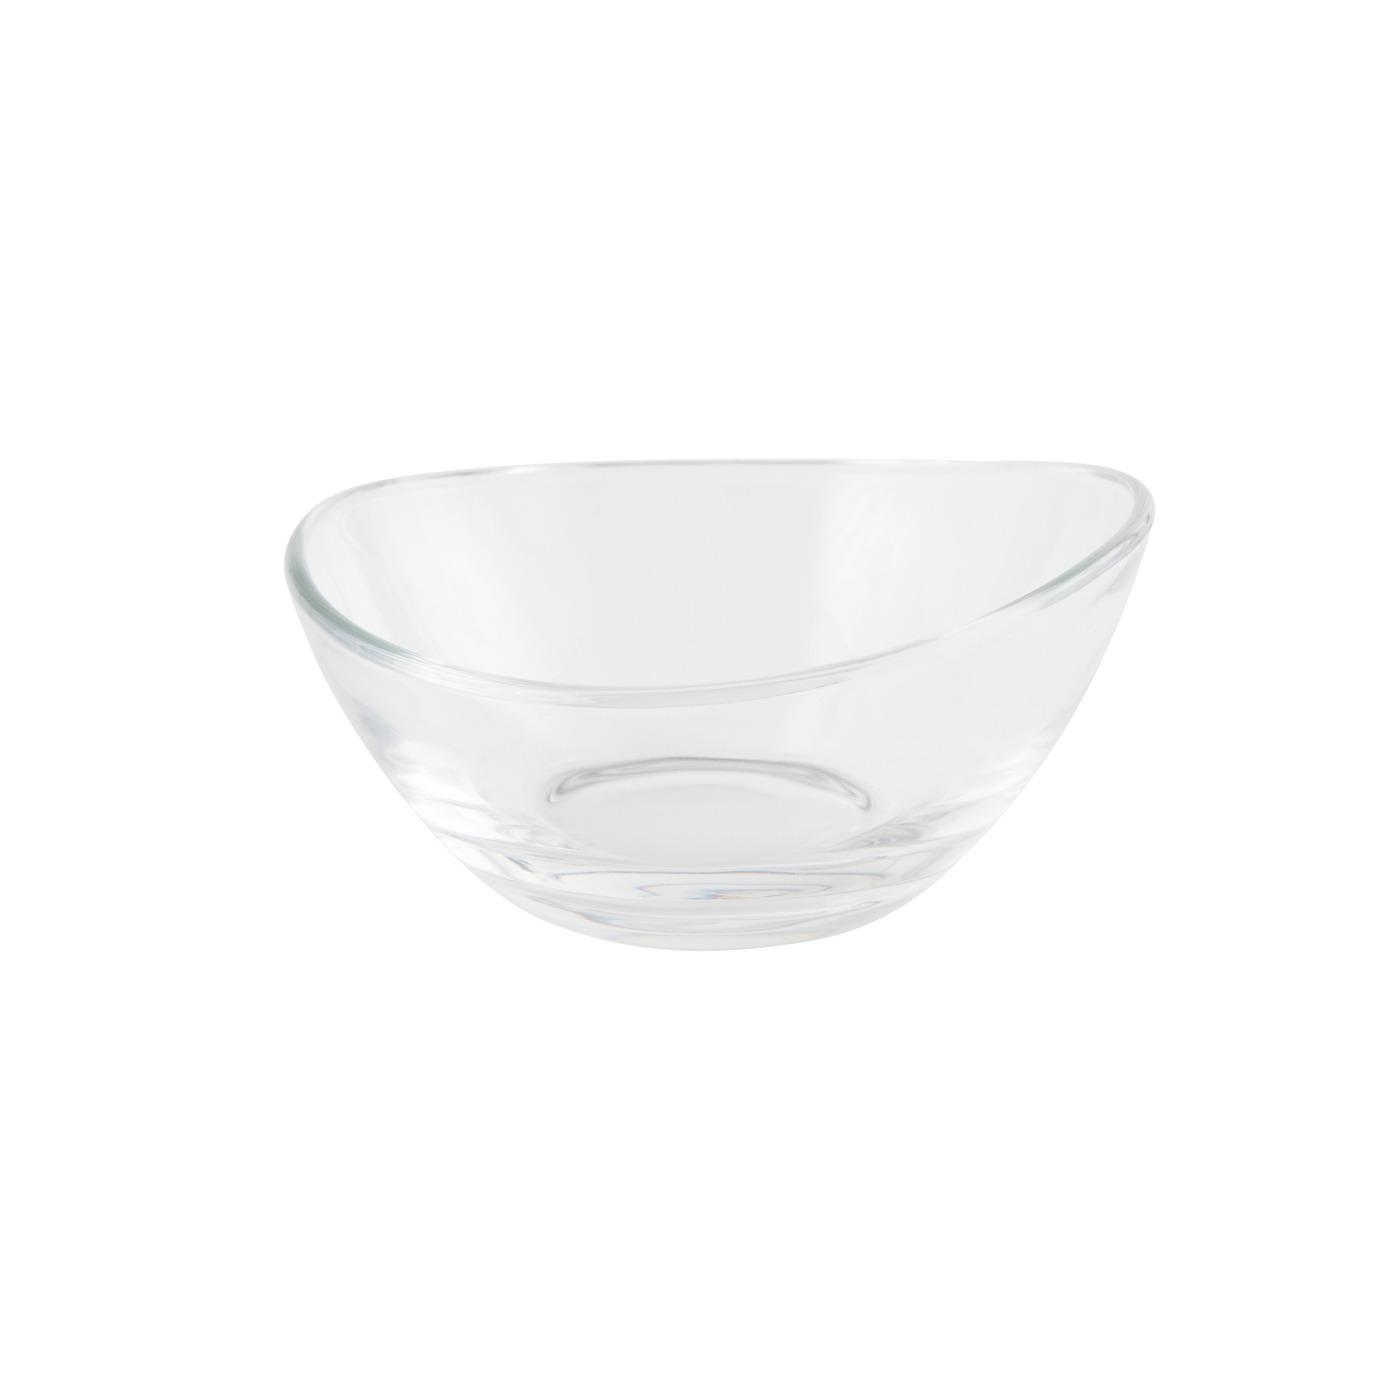 "Glass Papaya Bowl - 5.25"""